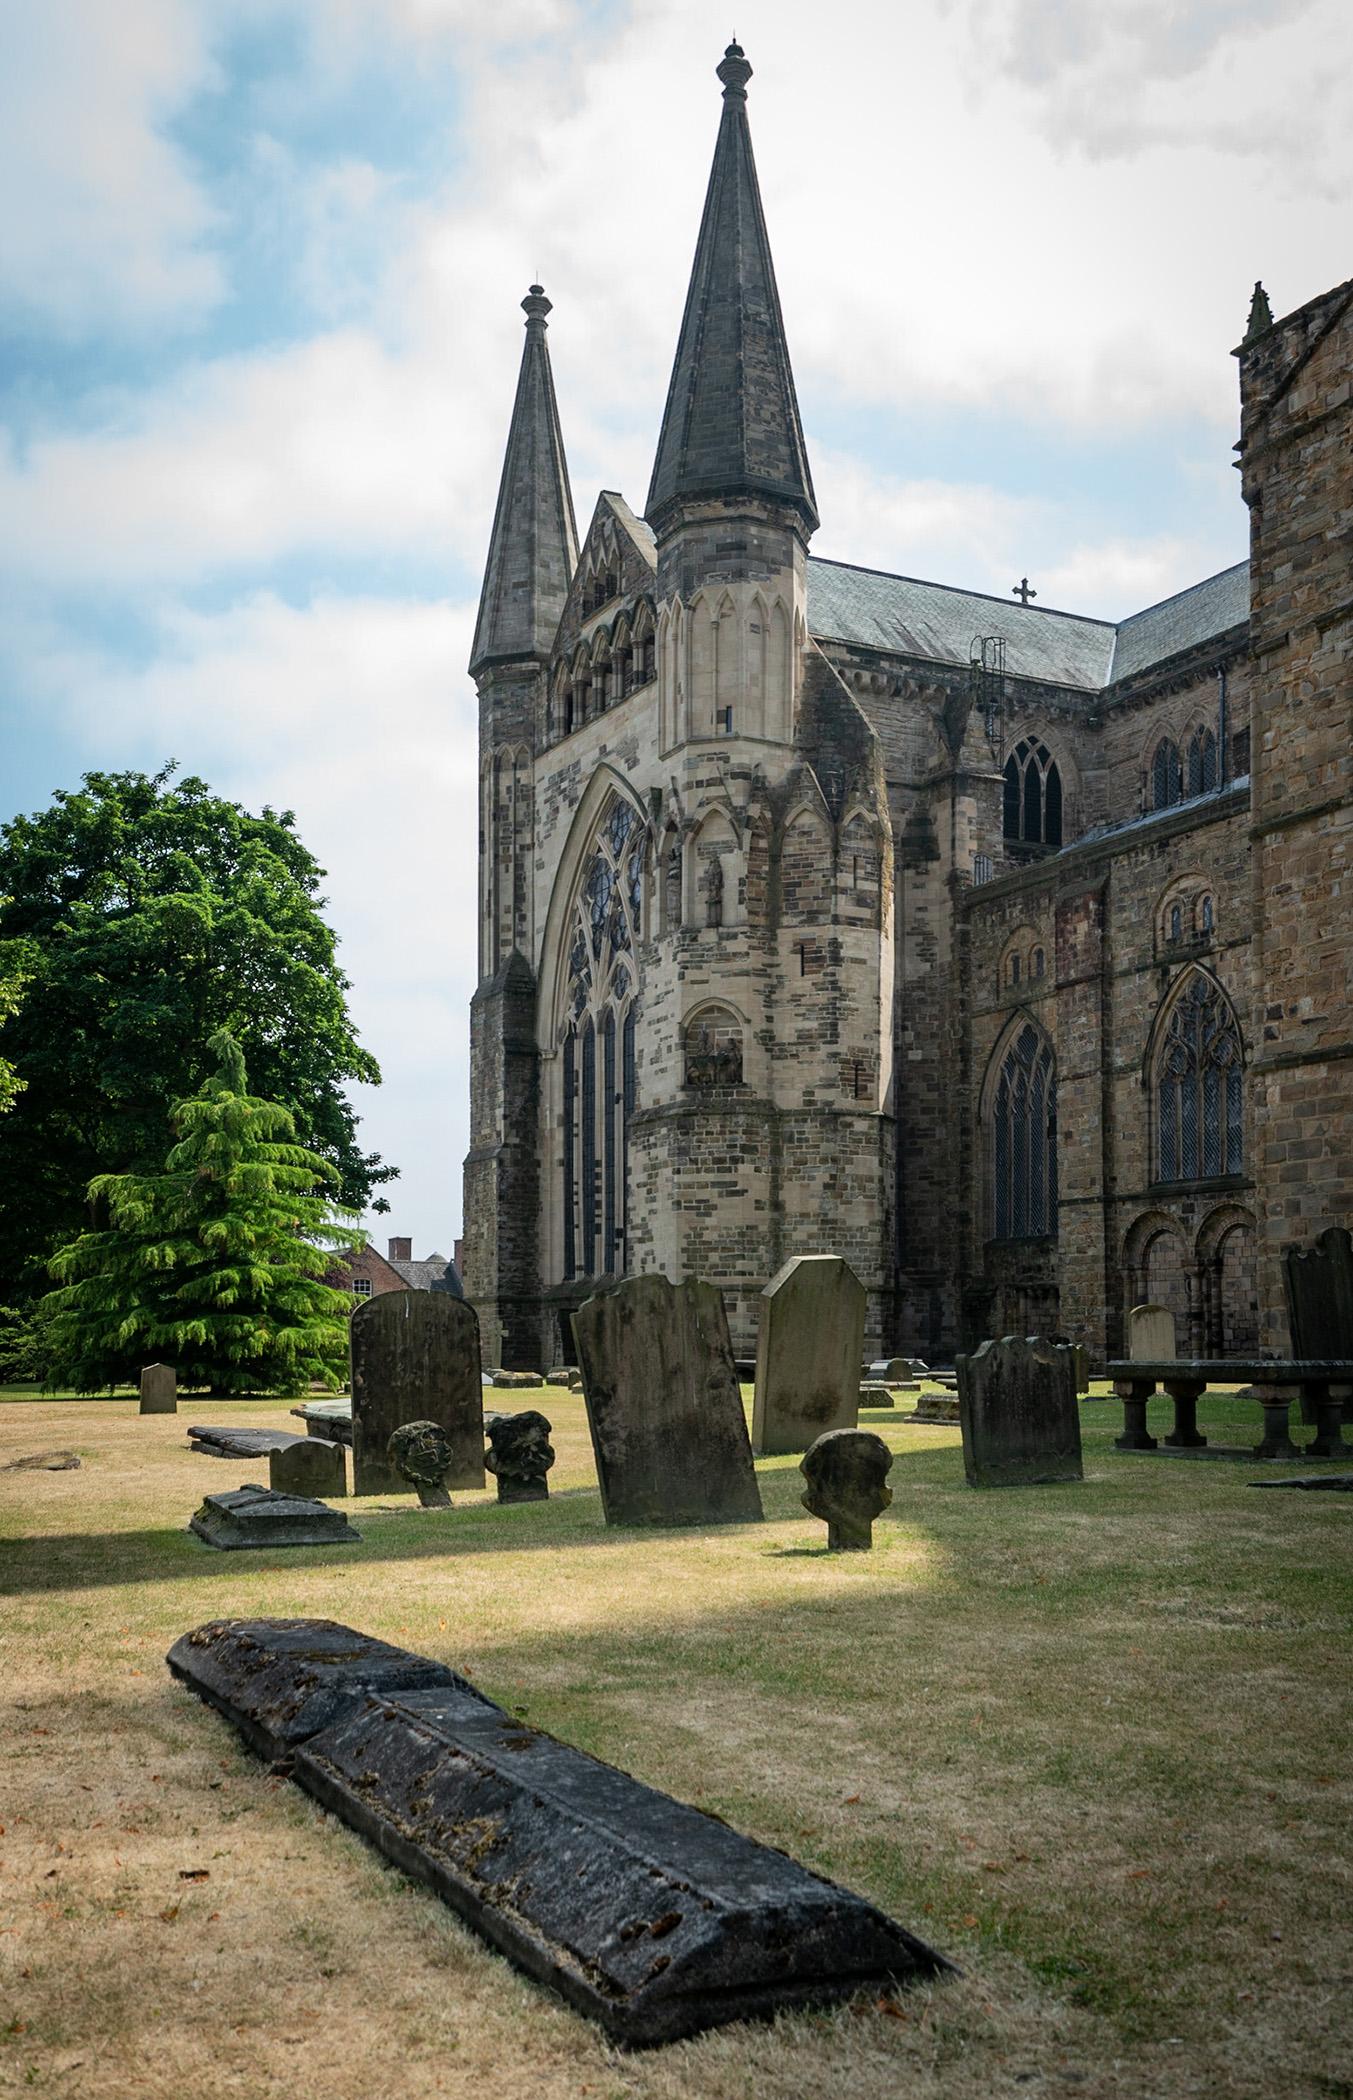 #durham, #cathedral, #england, #cemetery, #bishop, #priest, #history #travel, #iwonder